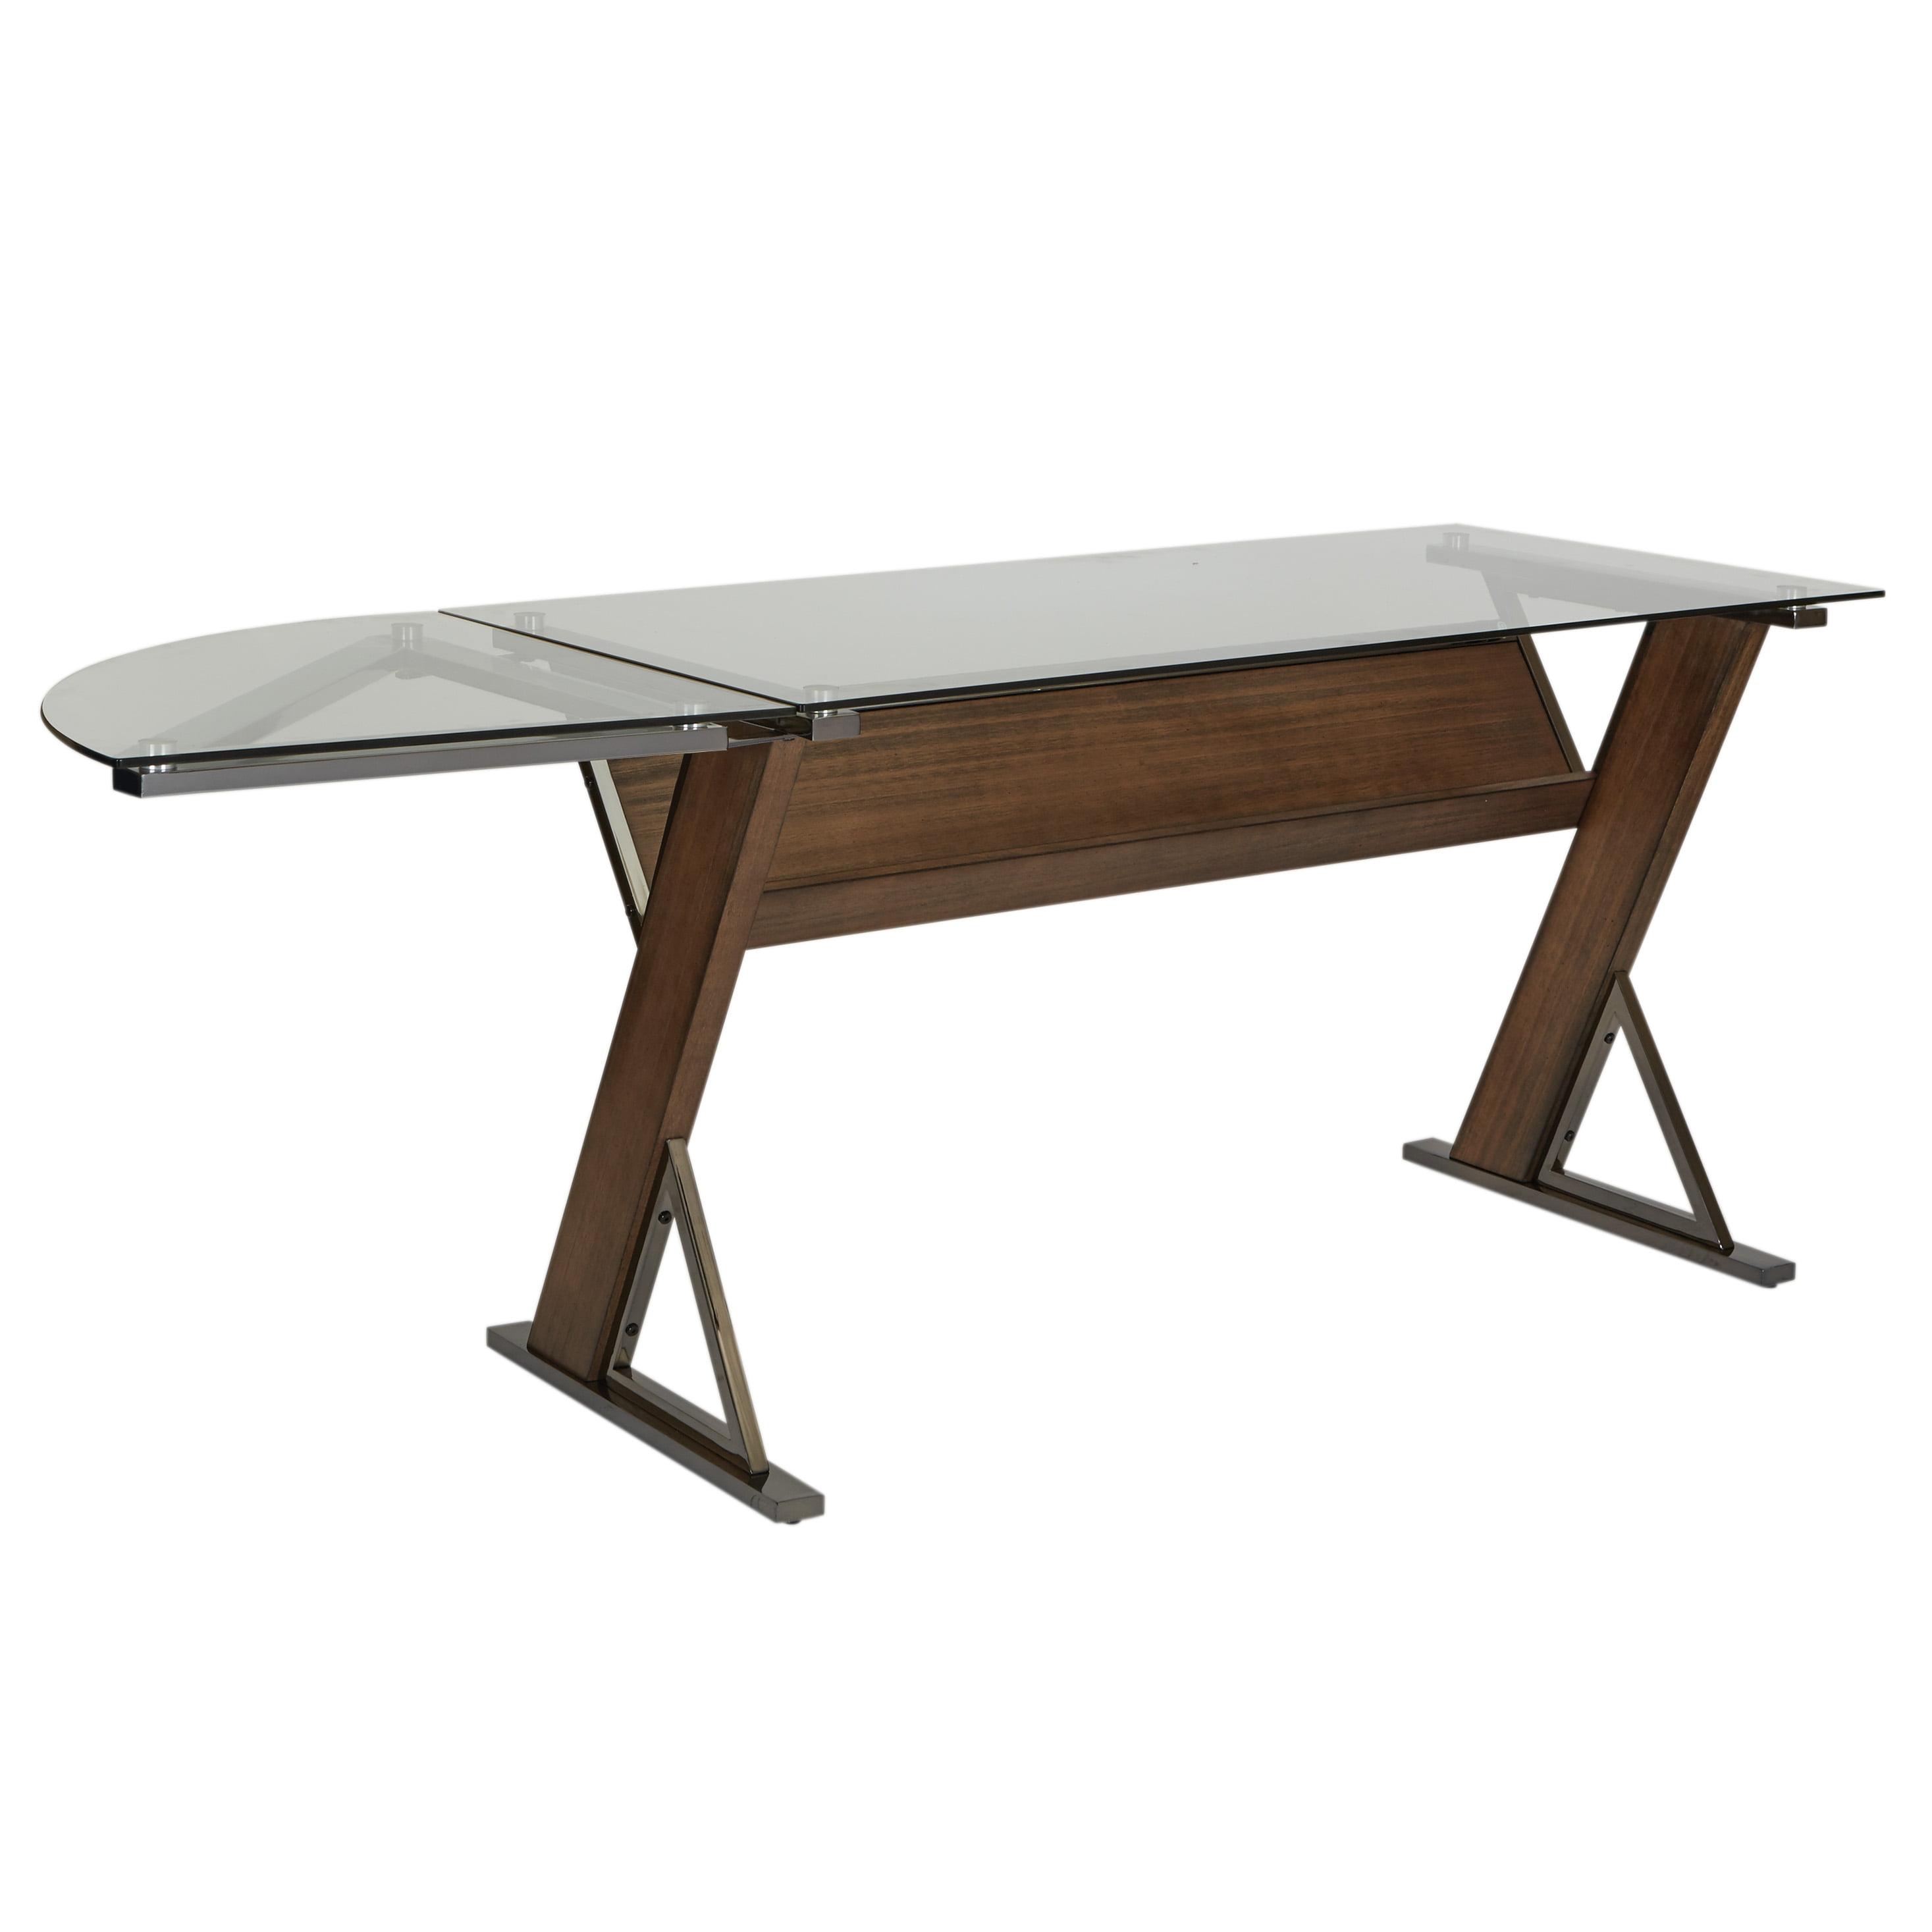 Eureka Small Desk Corner Unit with Carmel Wood and Black Nickel